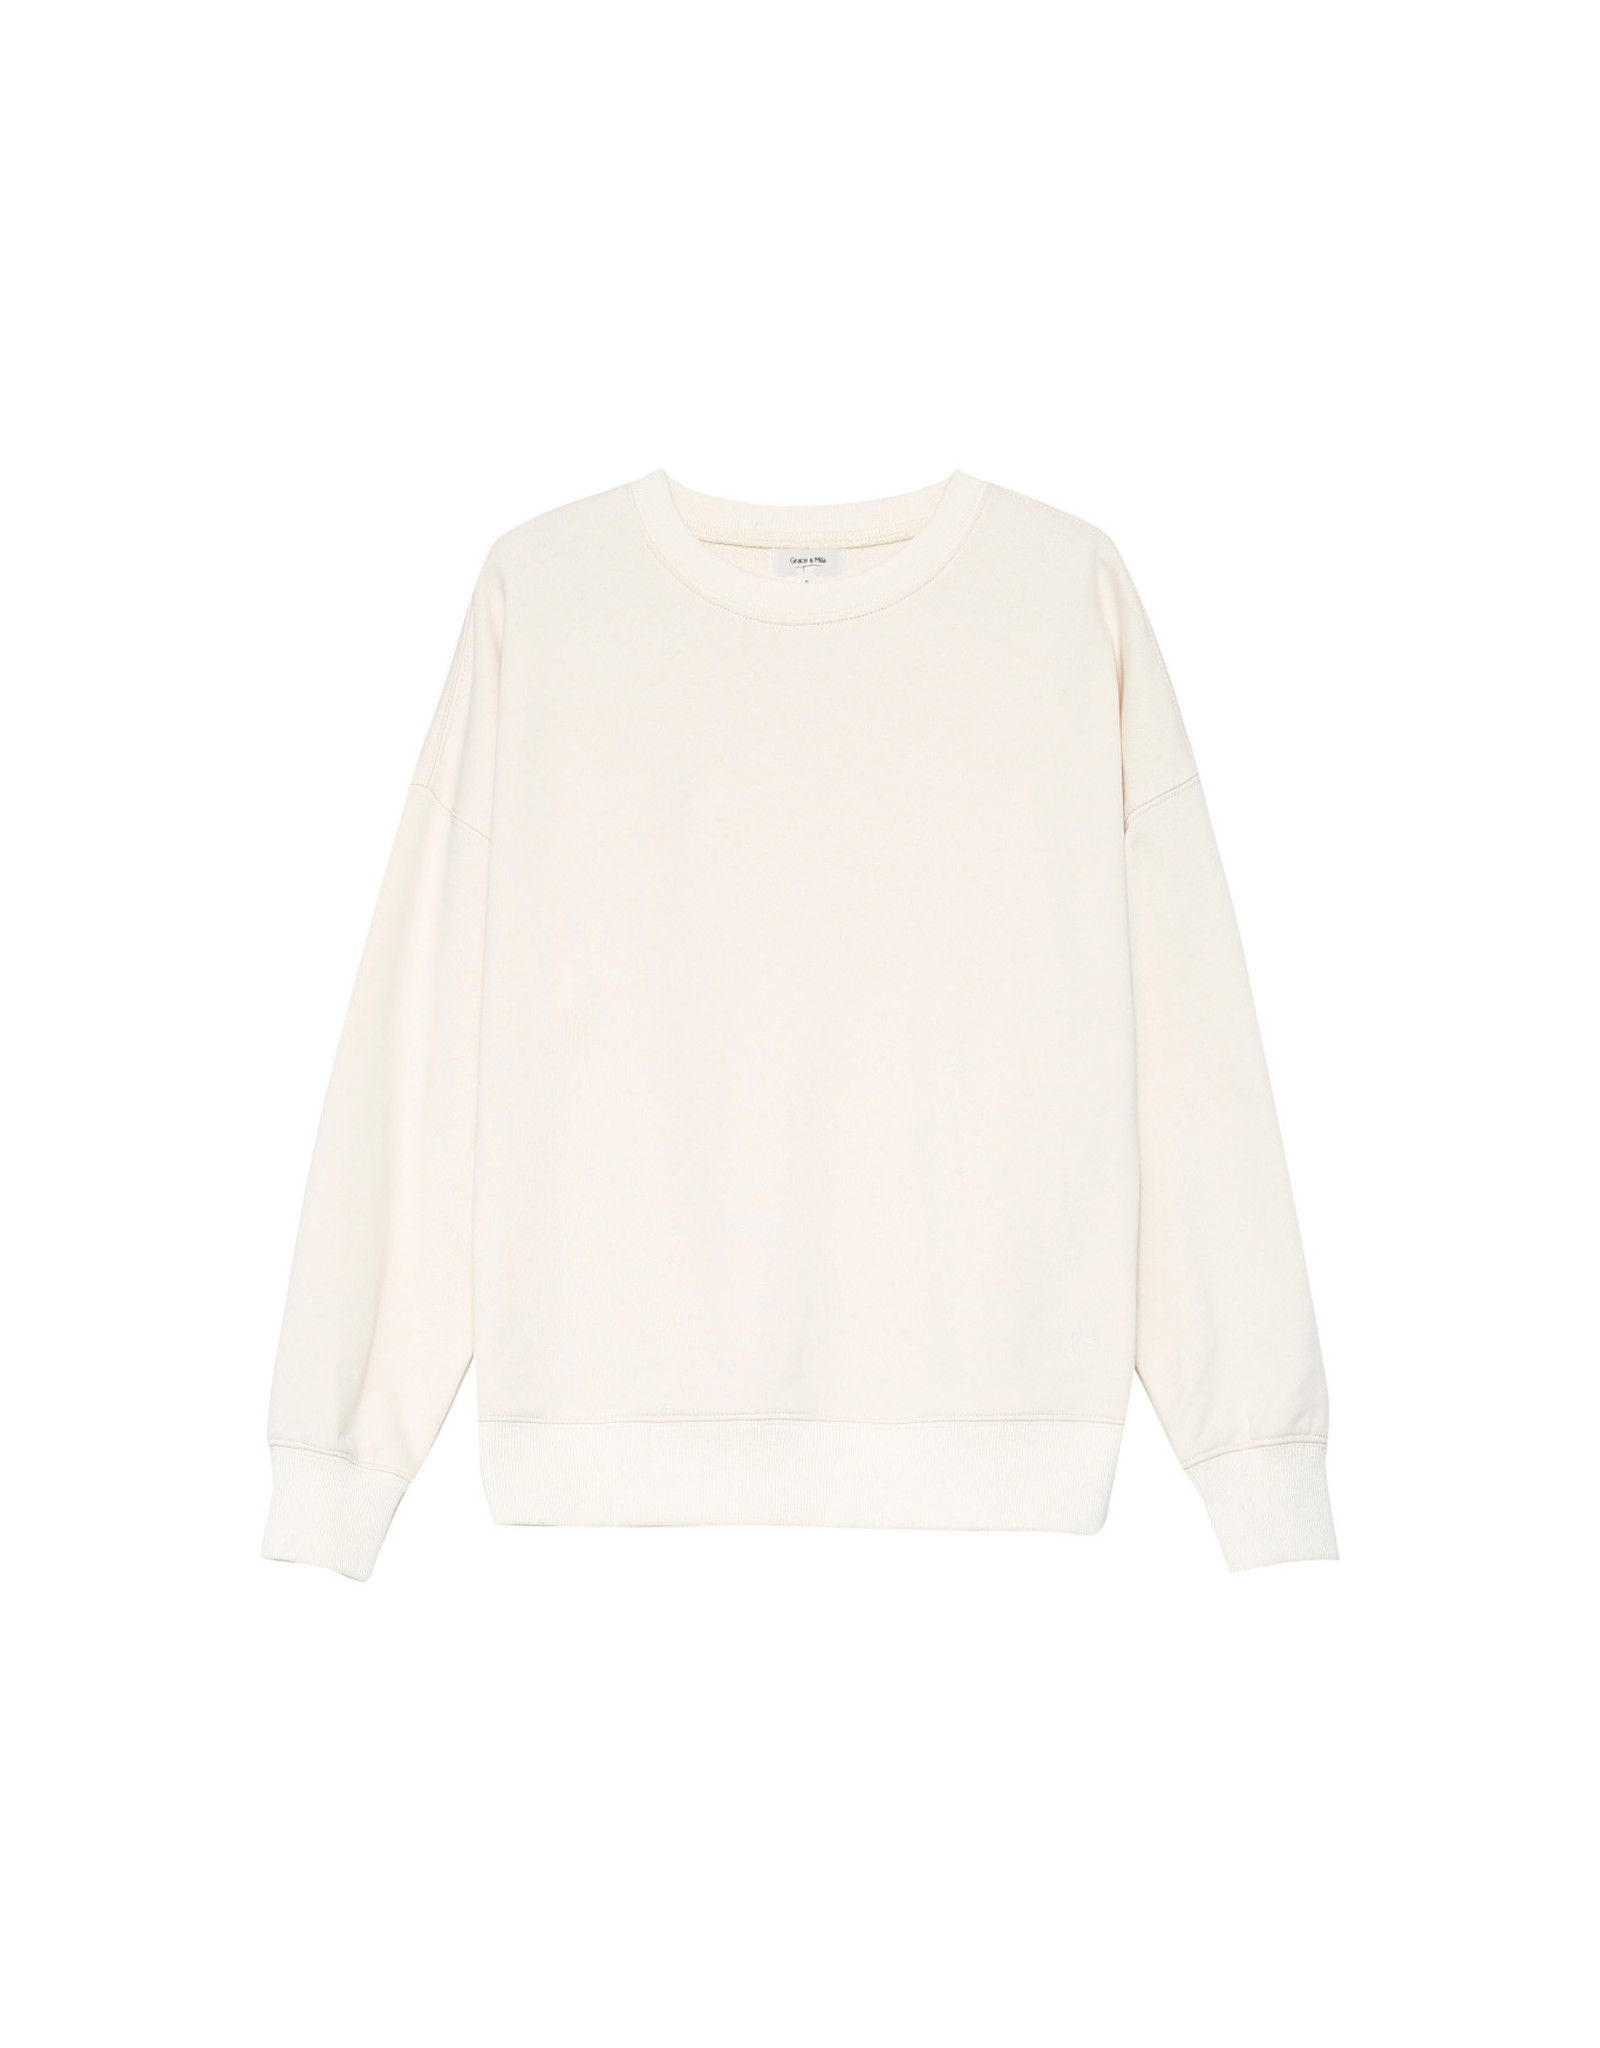 Charlie sweater